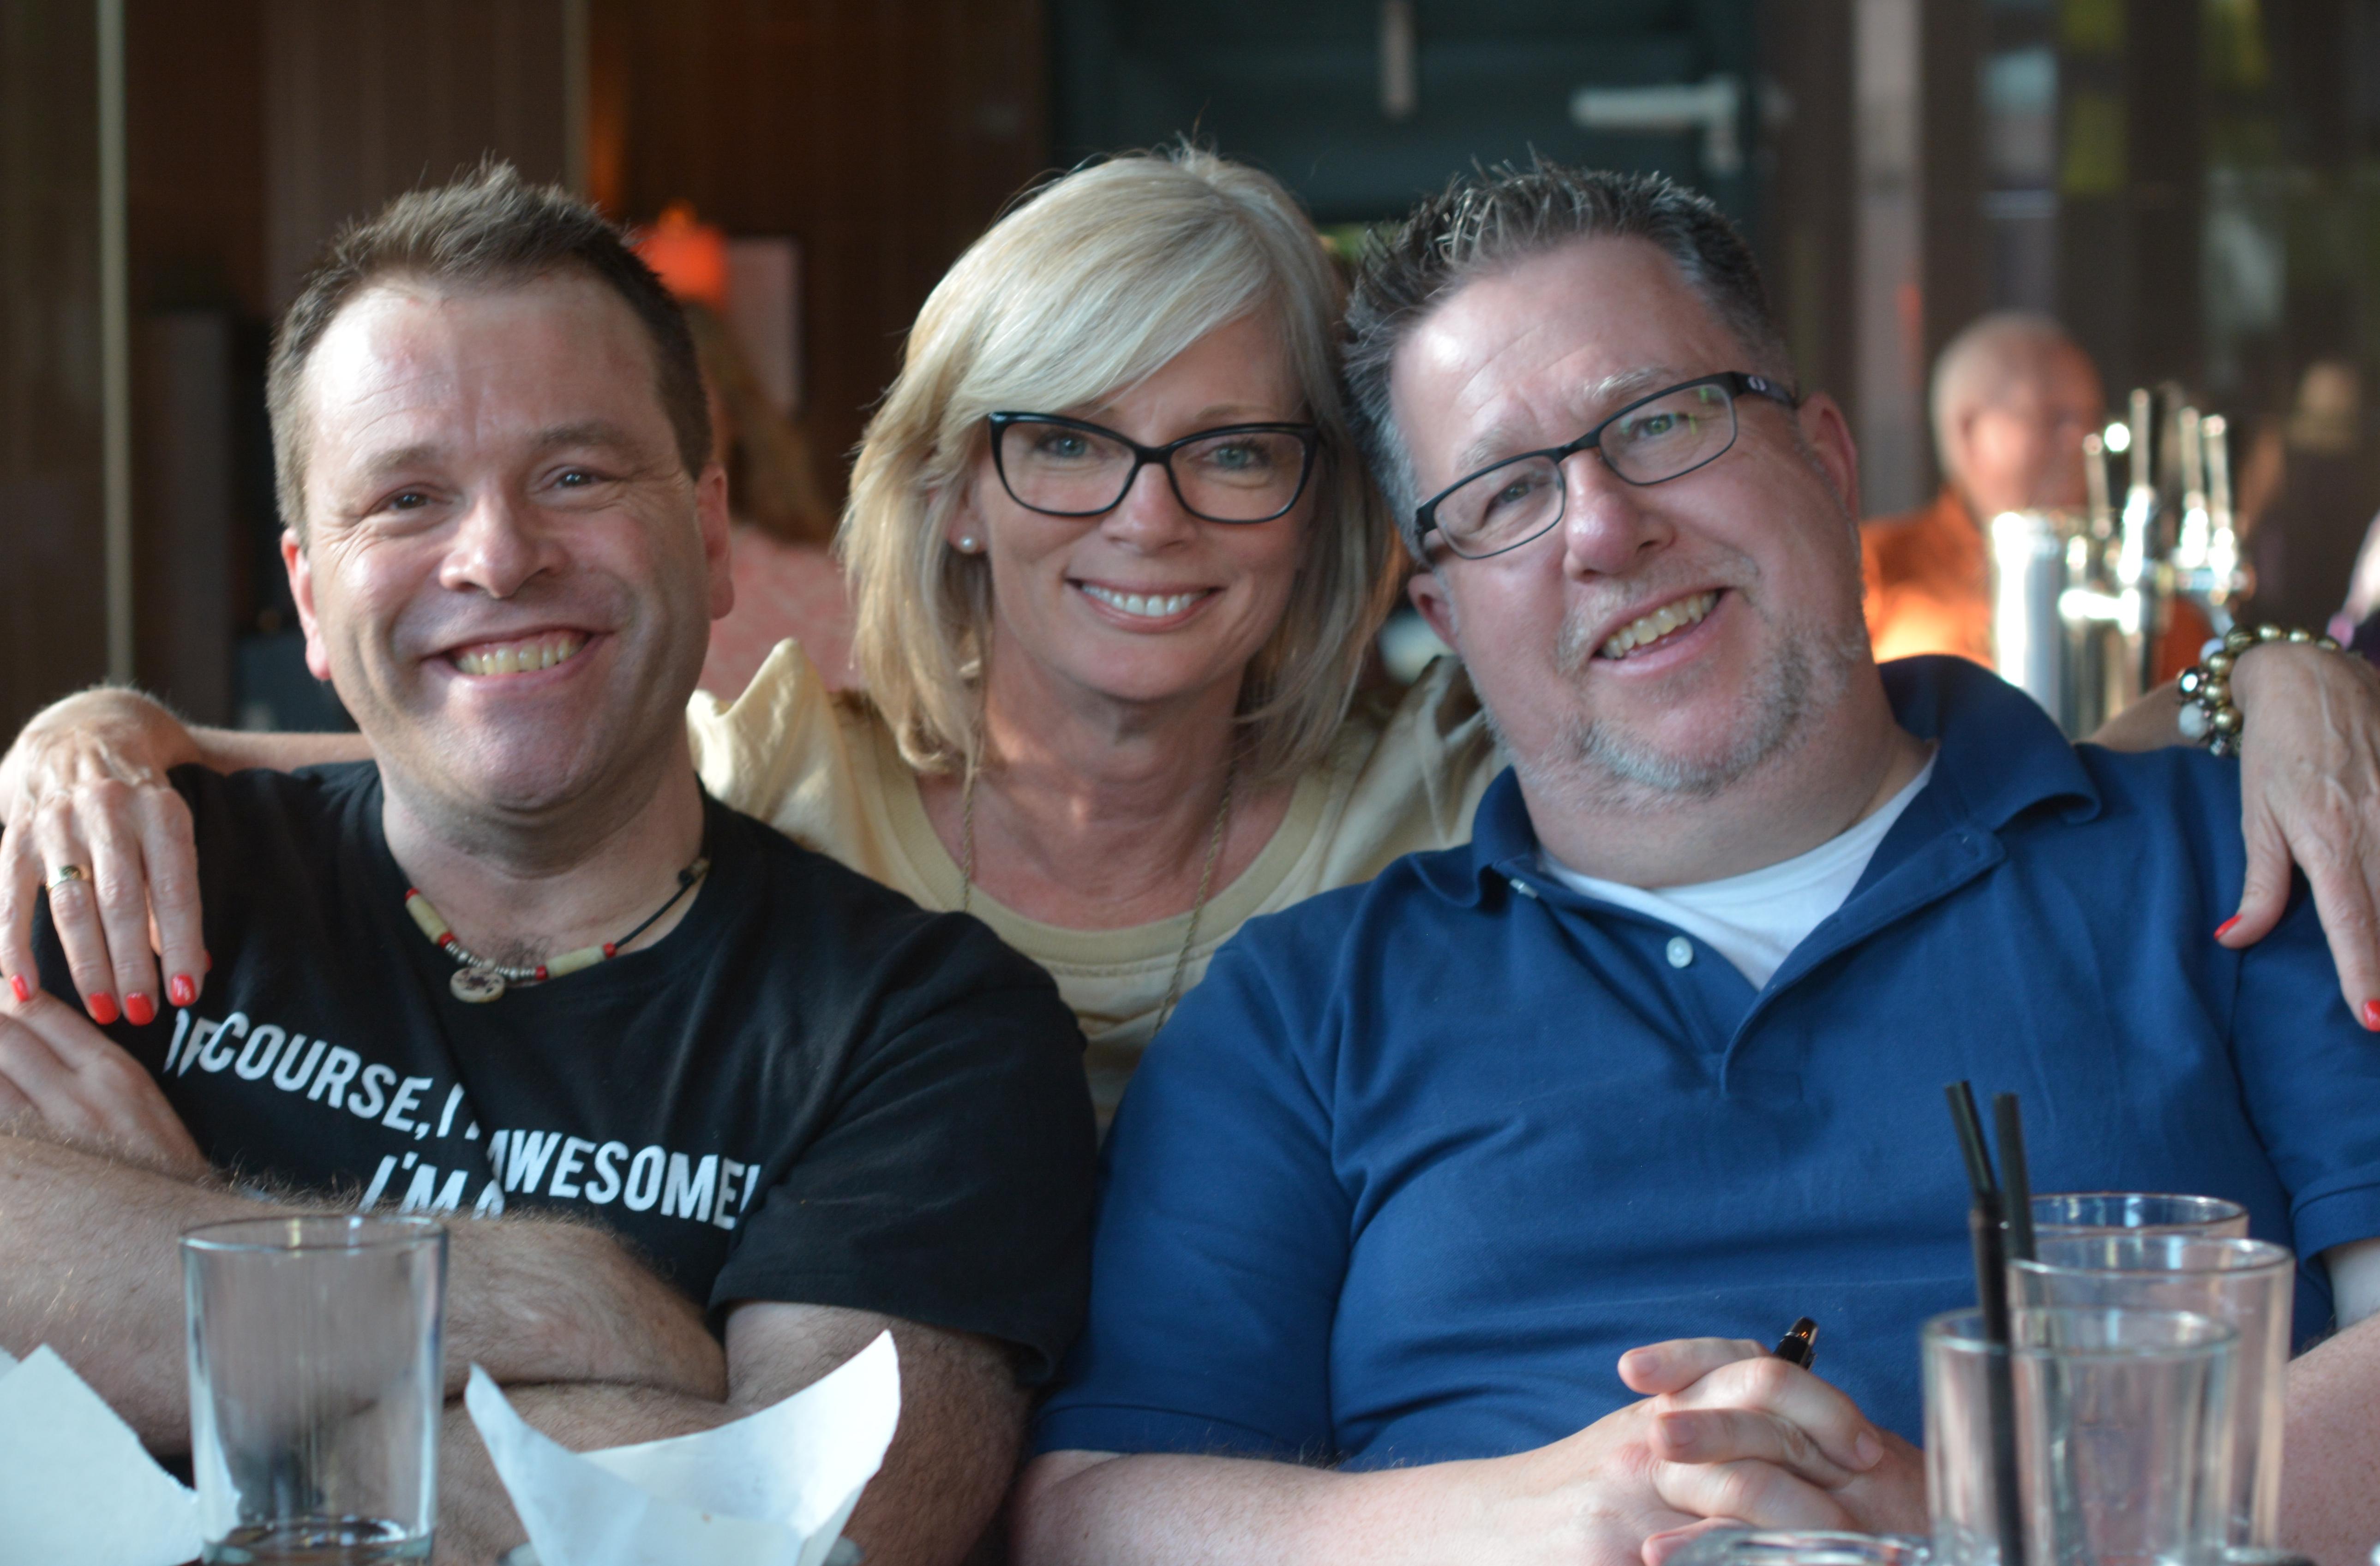 Sean Smith, Vicki McLeod and Steve Dotto